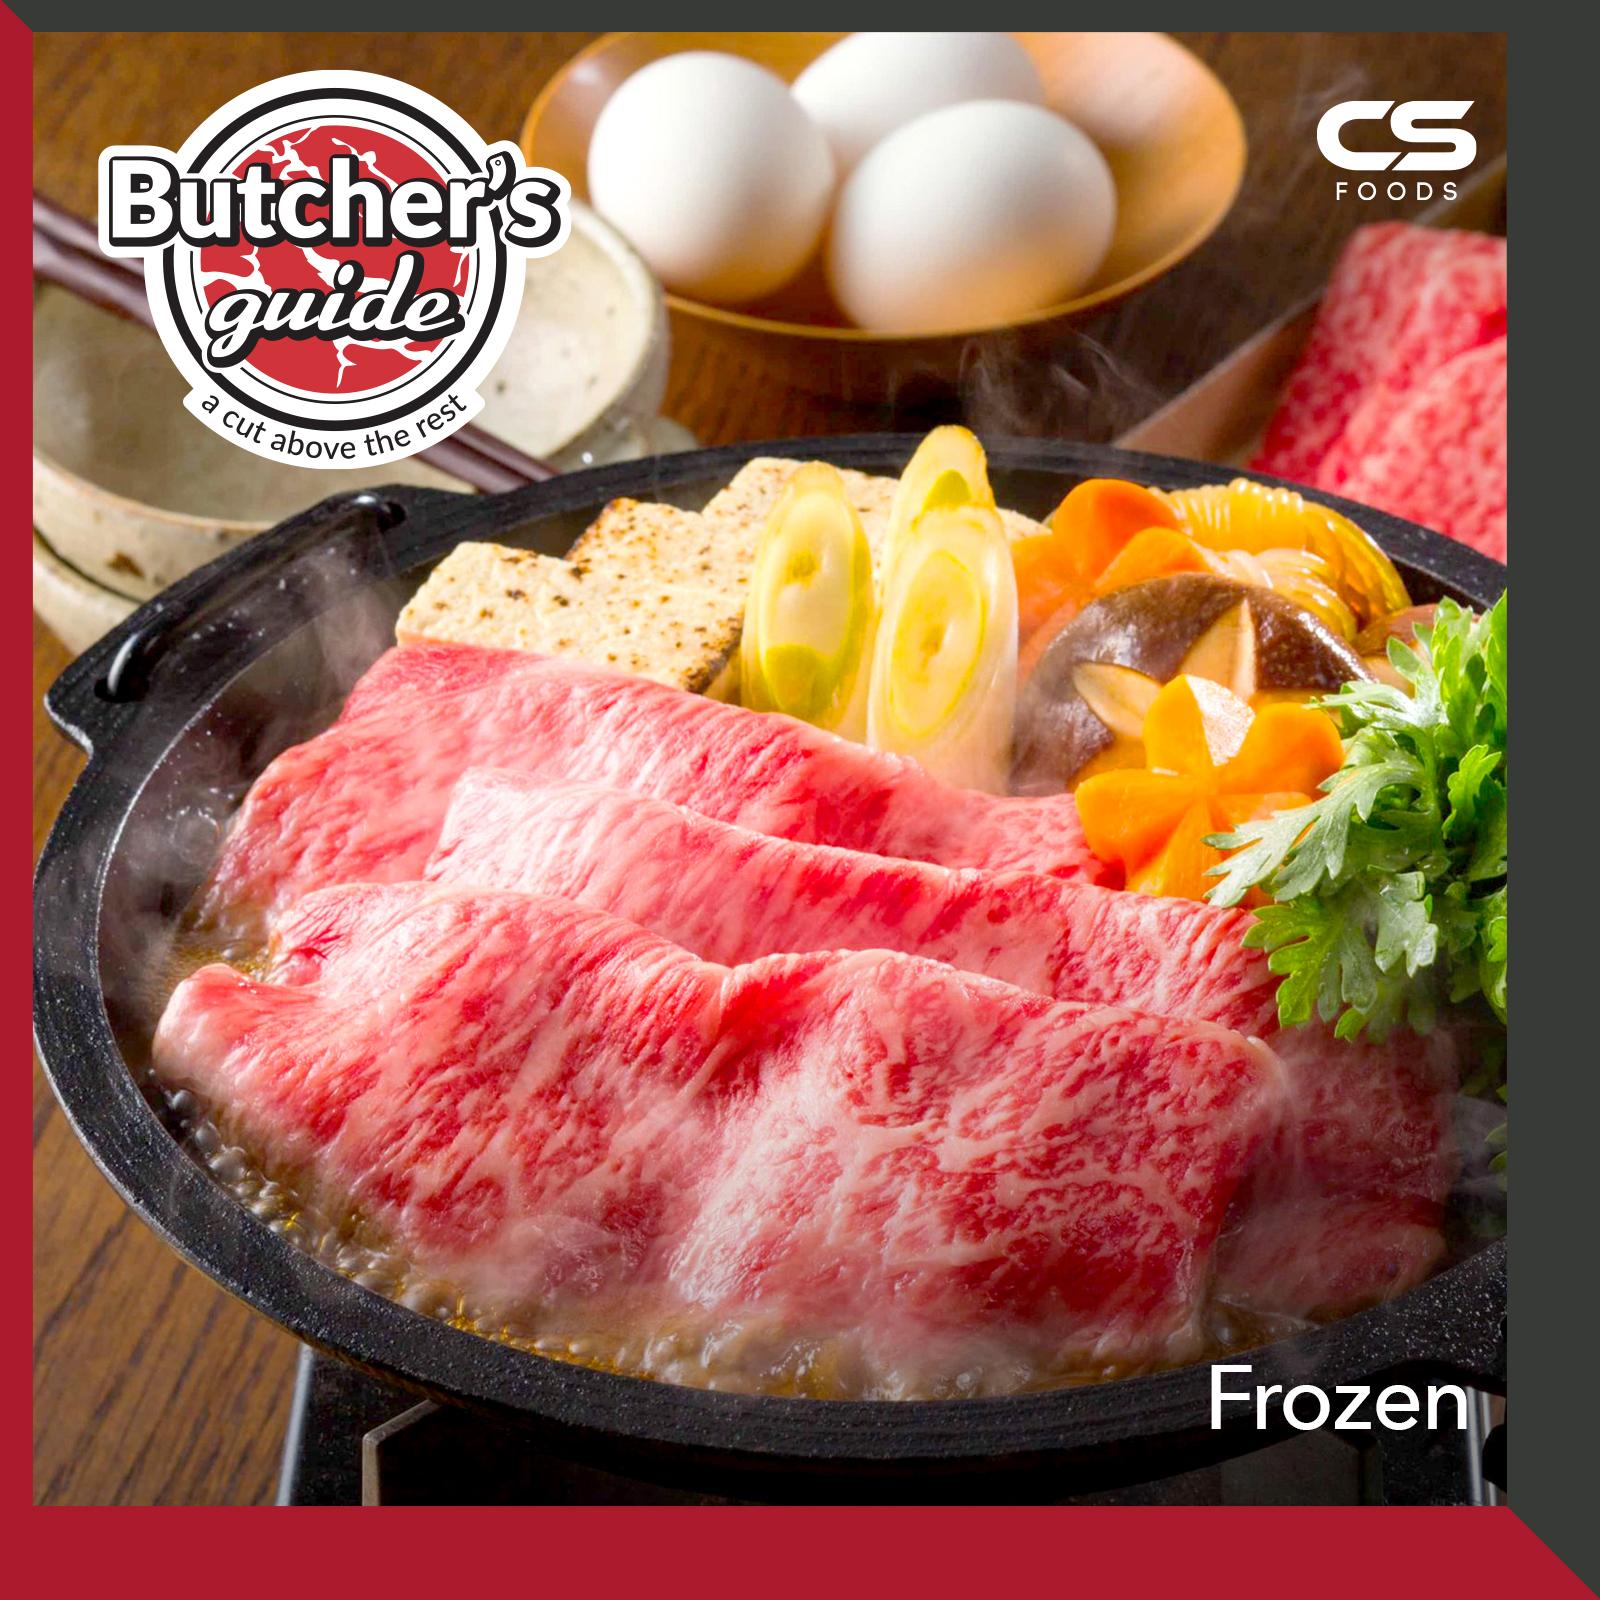 10)CS_Butcher_s-Guide-Beef-Wagyu-Shabu-S